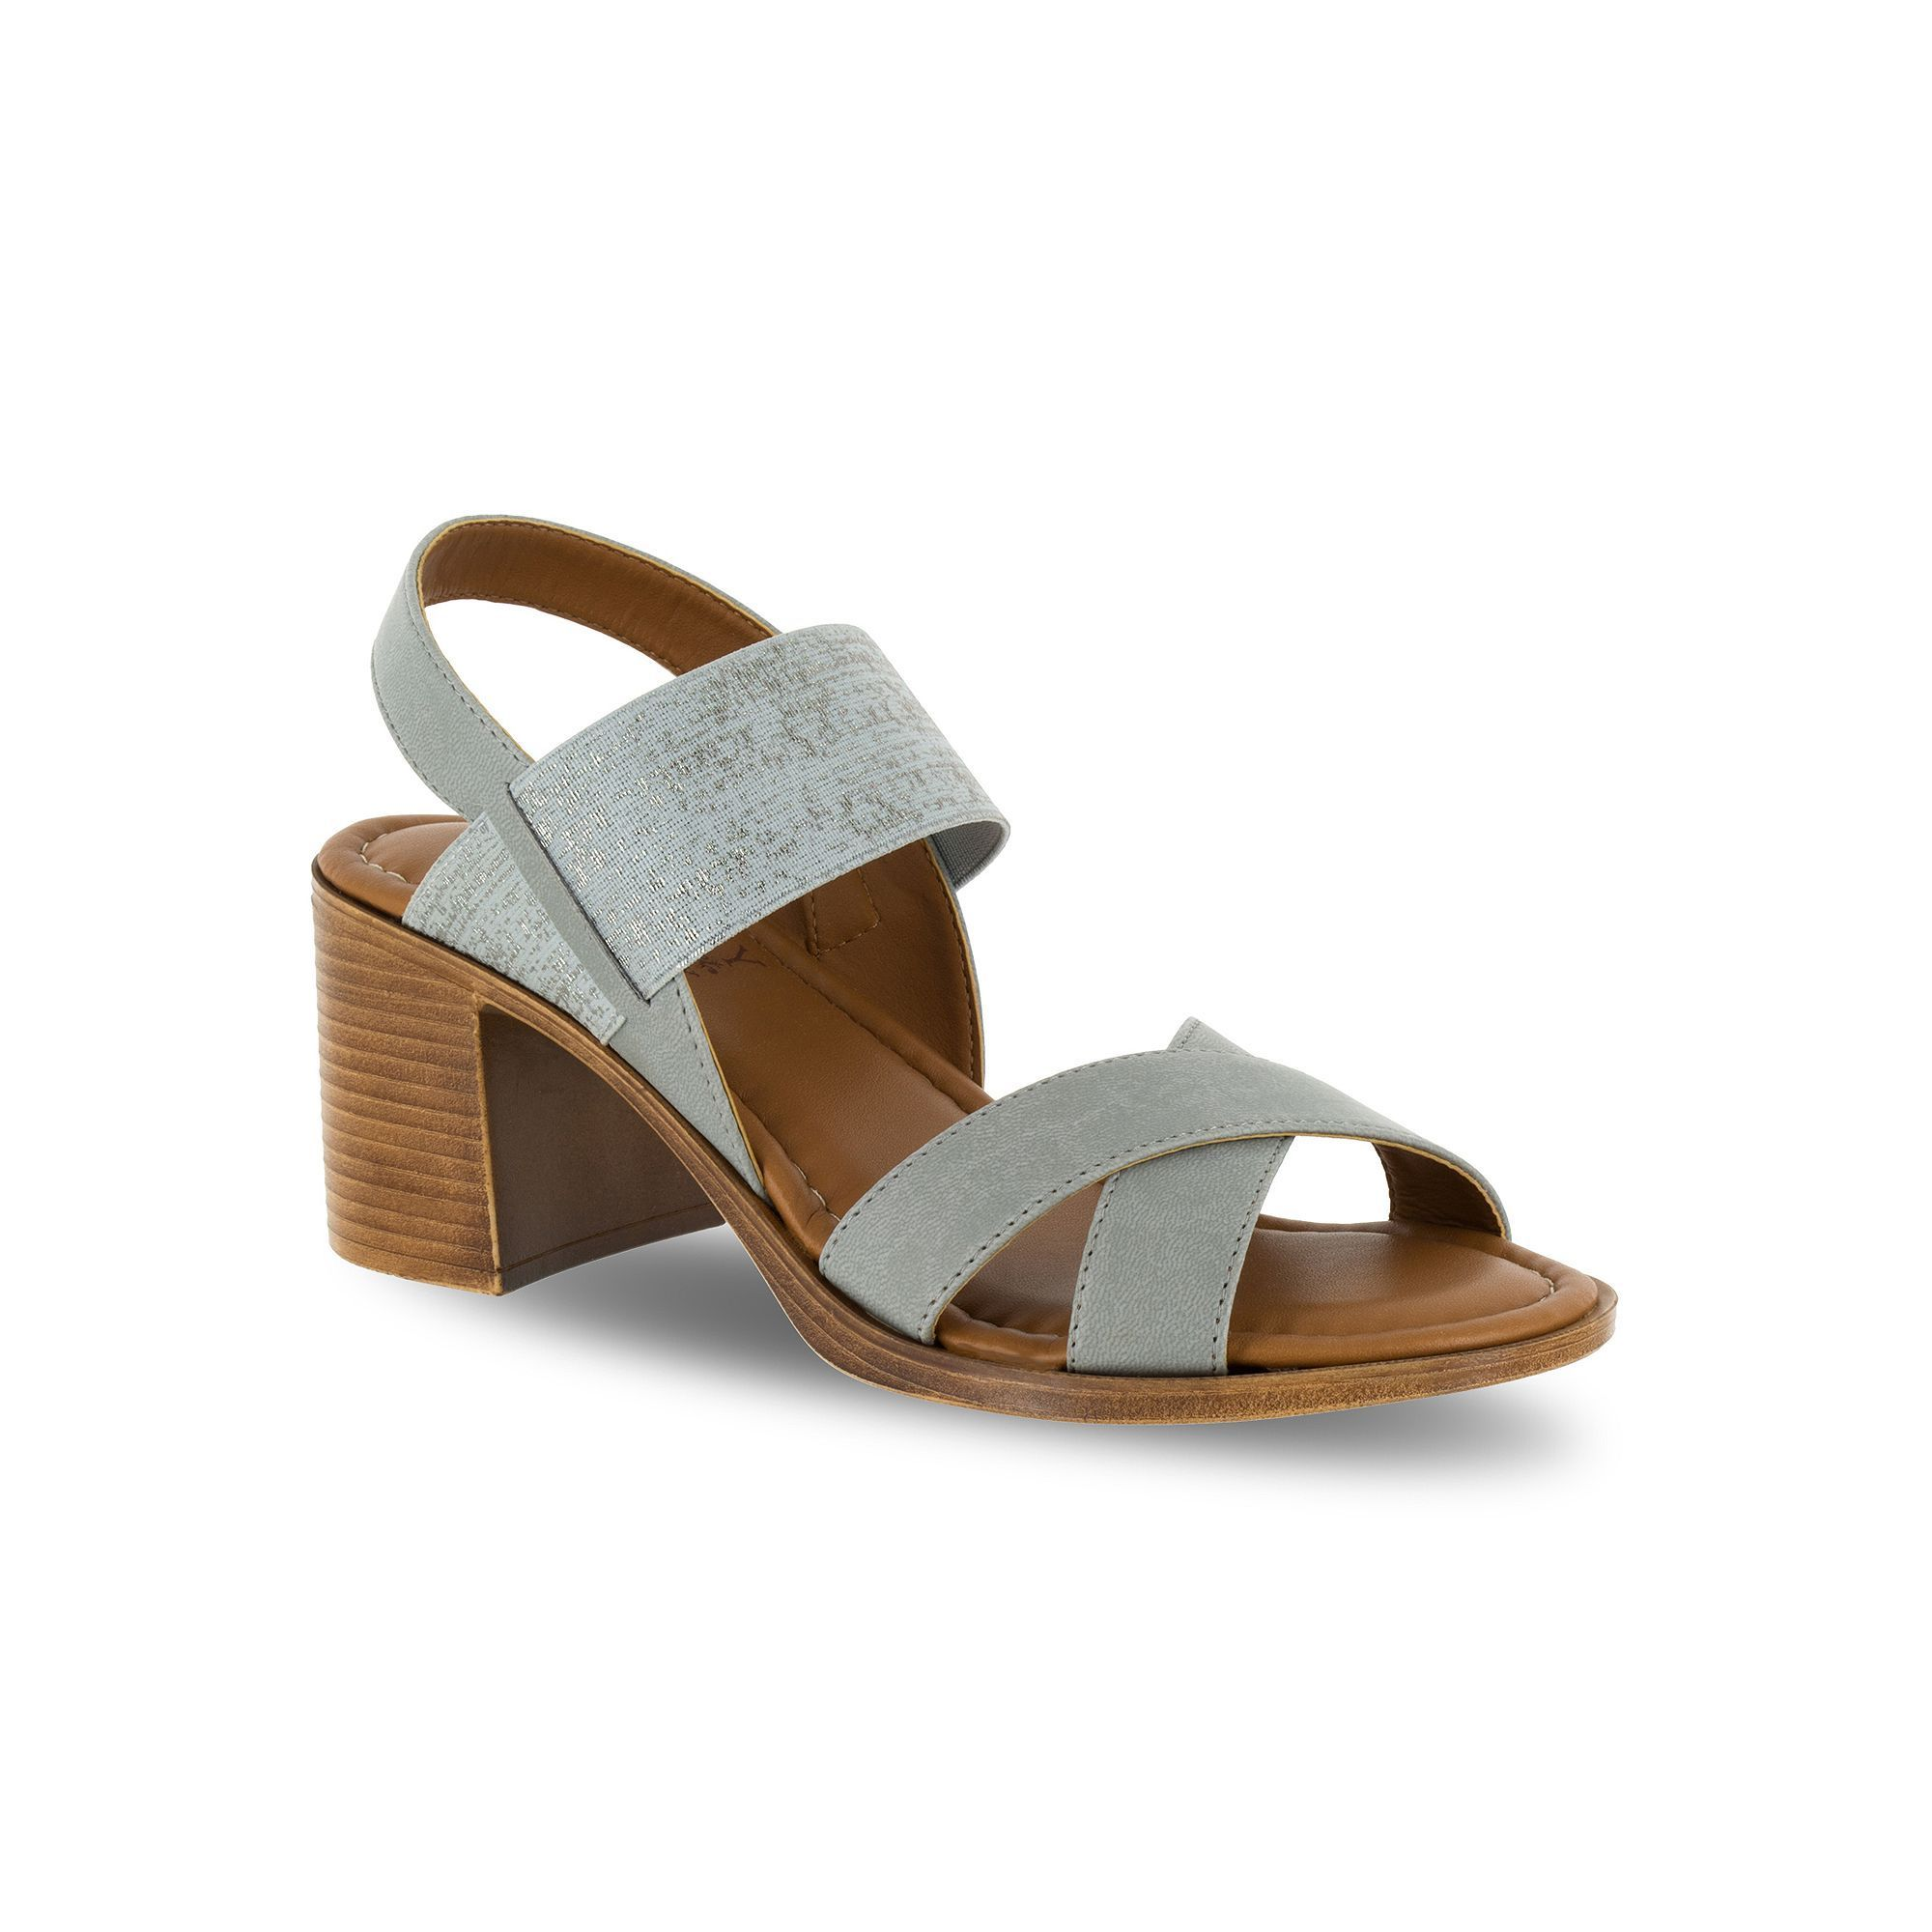 92850e50a75 Tuscany by Easy Street Perlita Women s Block Heel Sandals